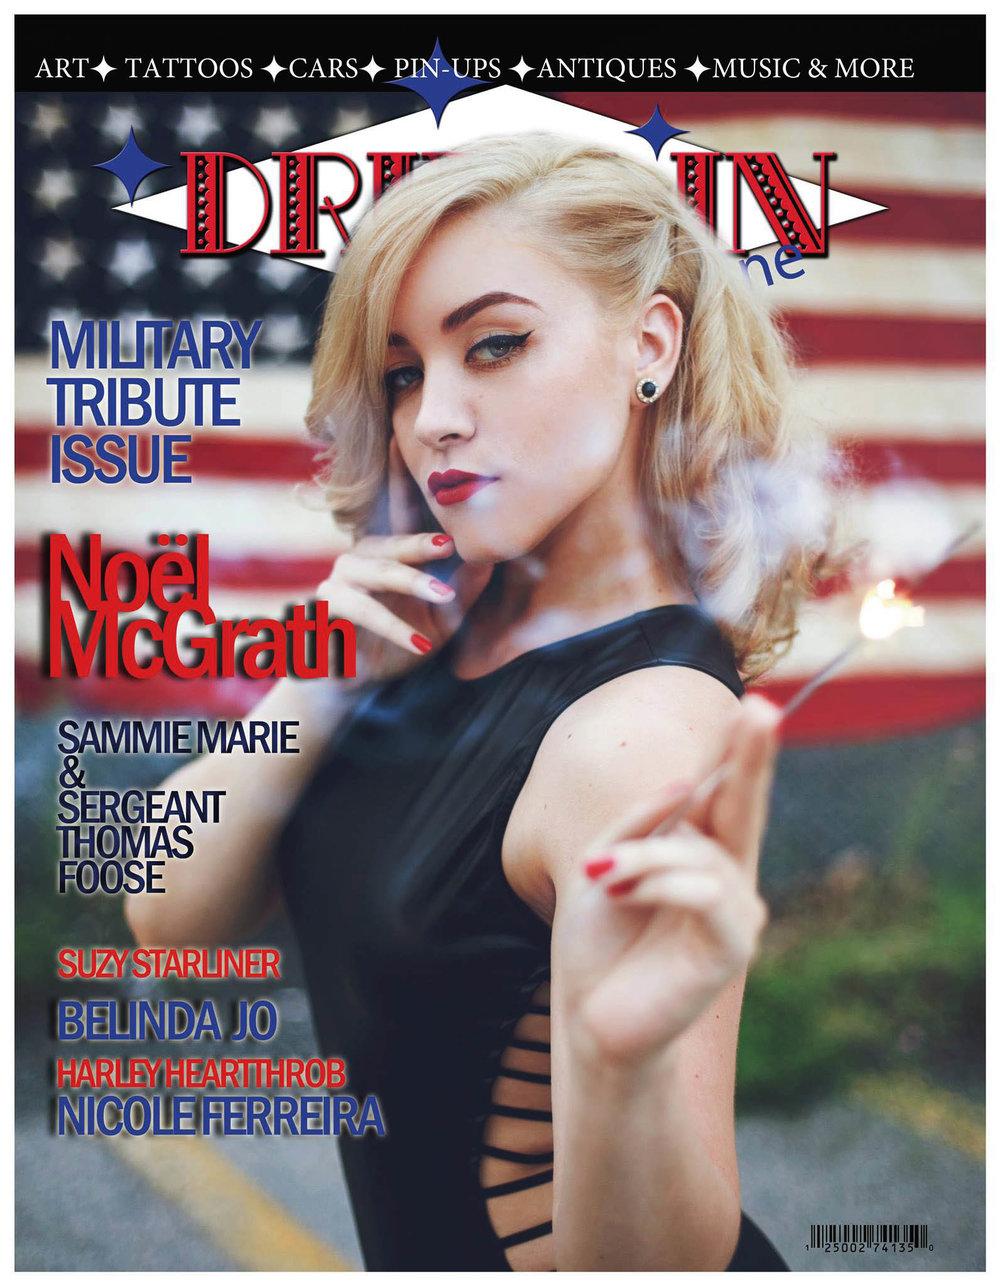 Krista Lajara x Drive In Magazine